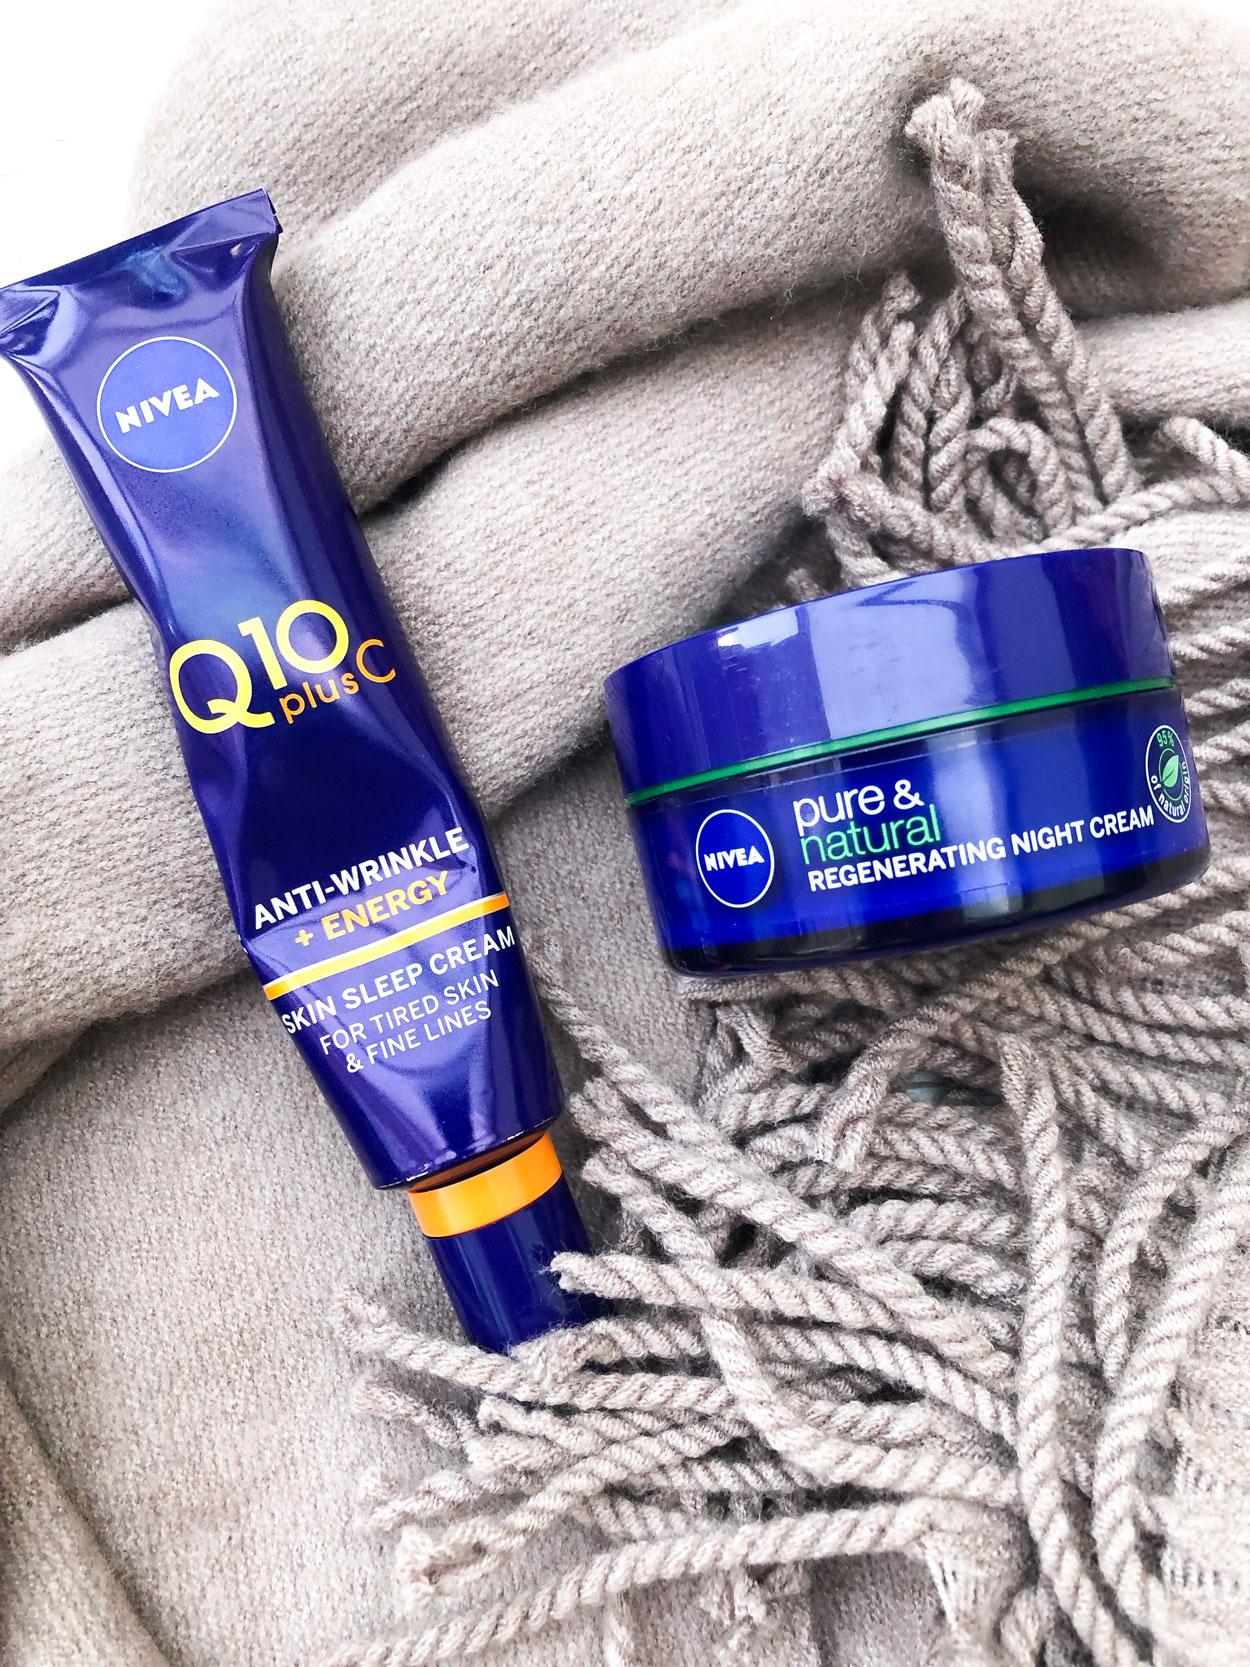 Nivea-Q10-Plus-C-Anti-Wrinkle-Energy-night-sleep-cream-regnerating-night-cream-nivea-uk-the-beauty-type